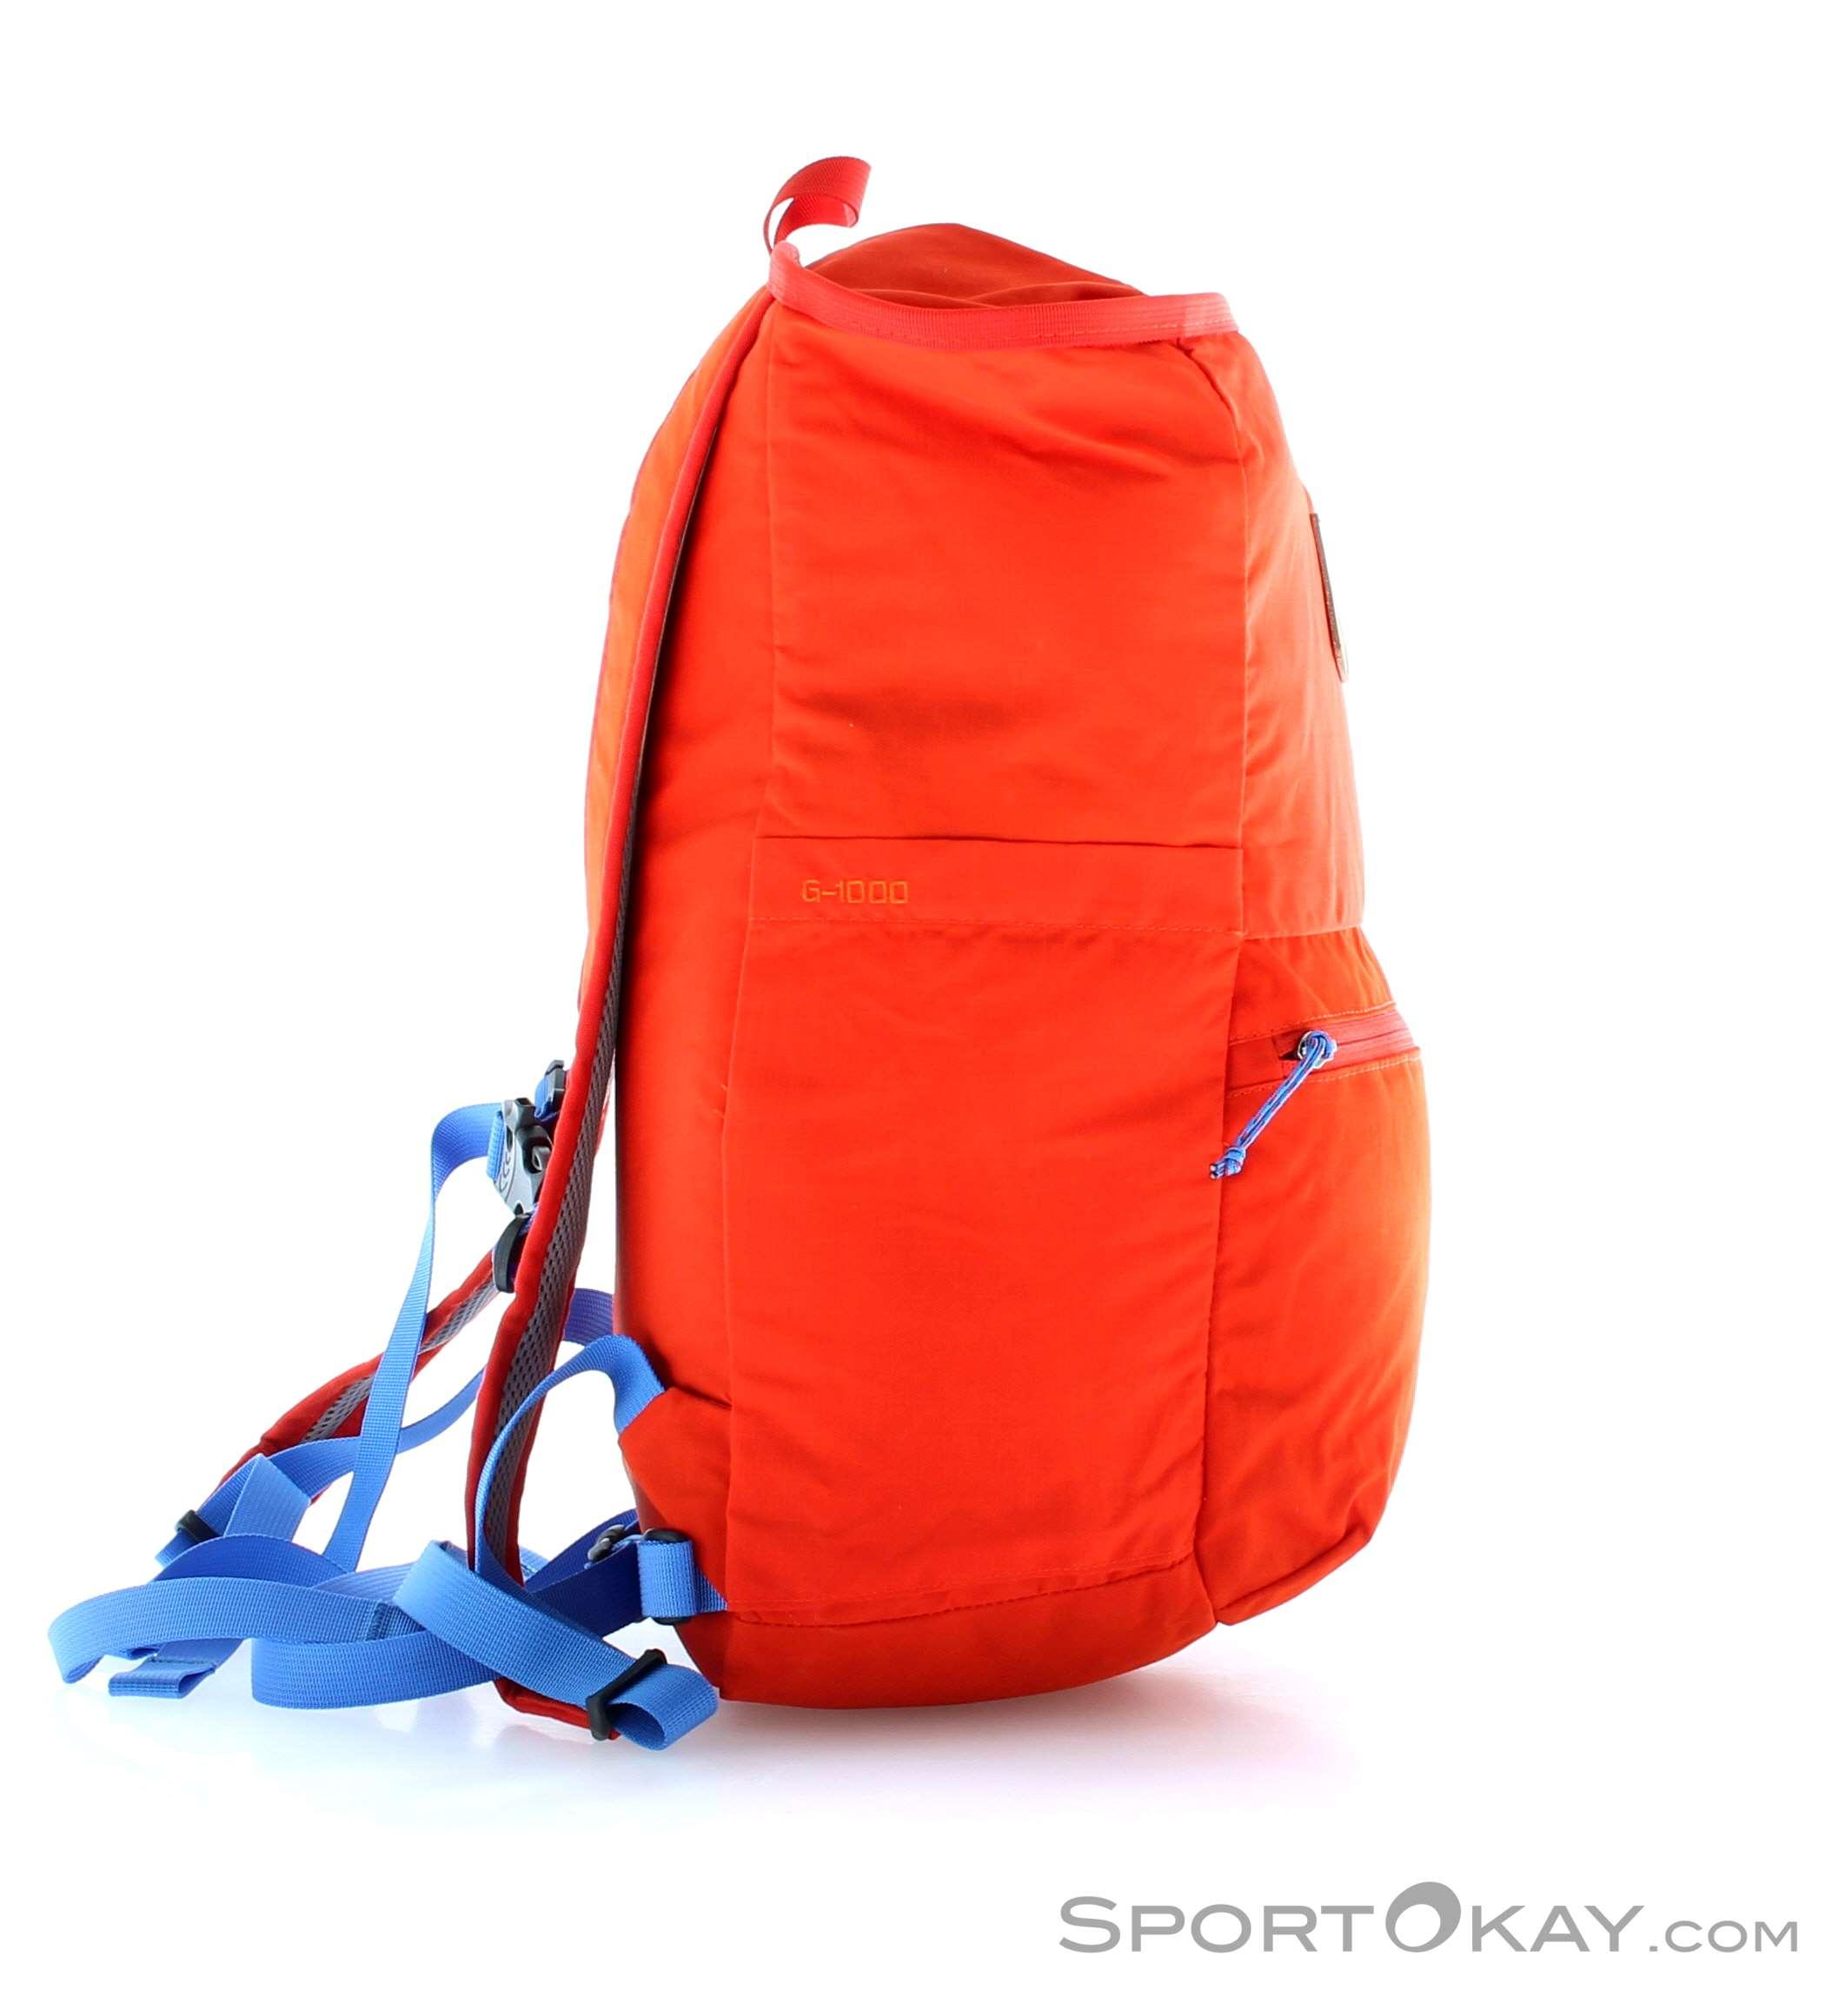 fjallraven high coast rucksack